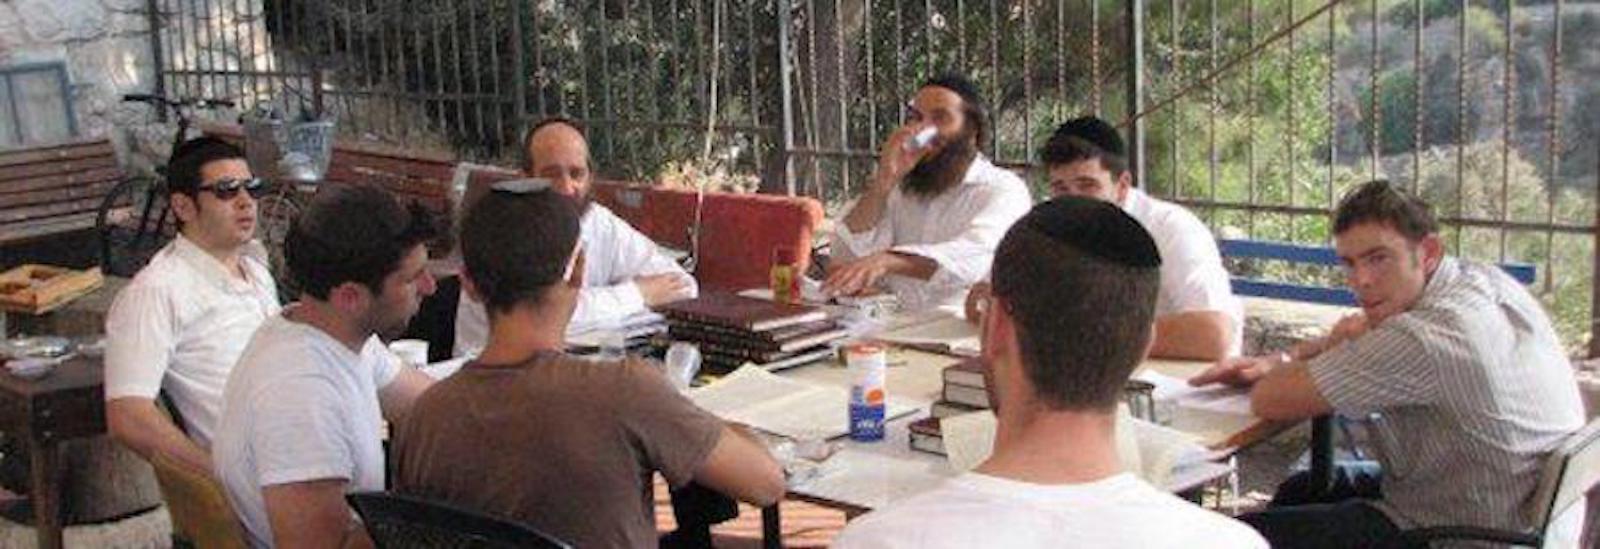 The Global Yeshiva in Jerusalem